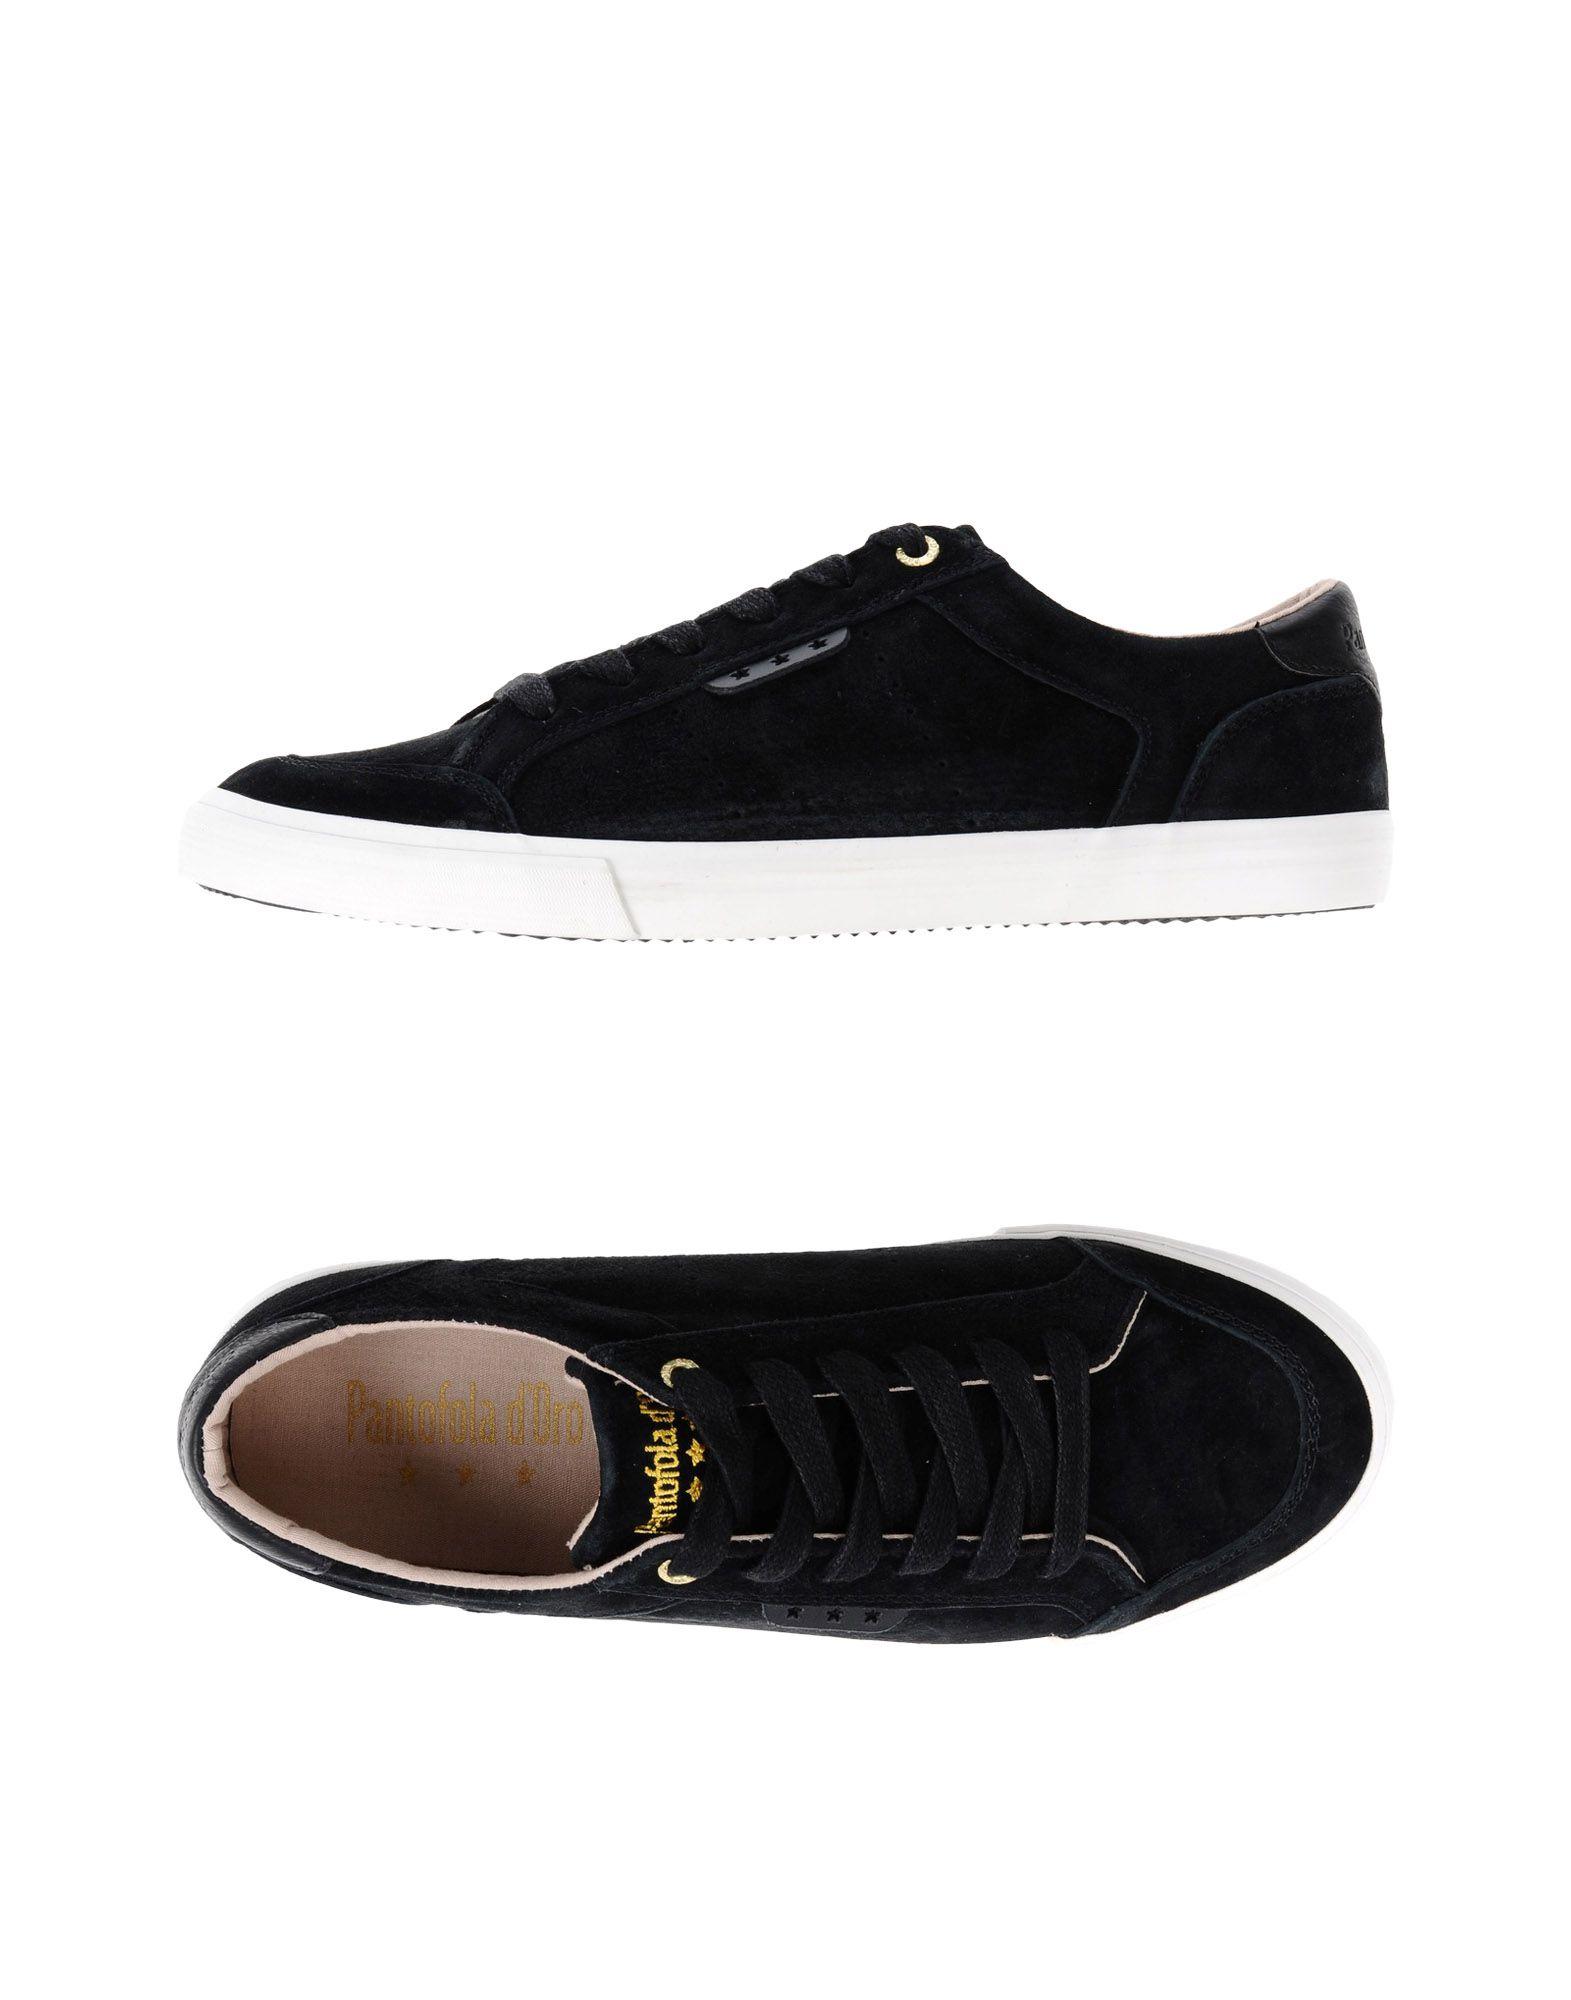 Sneakers 11338485VF Pantofola D'oro Uomo - 11338485VF Sneakers 20f587